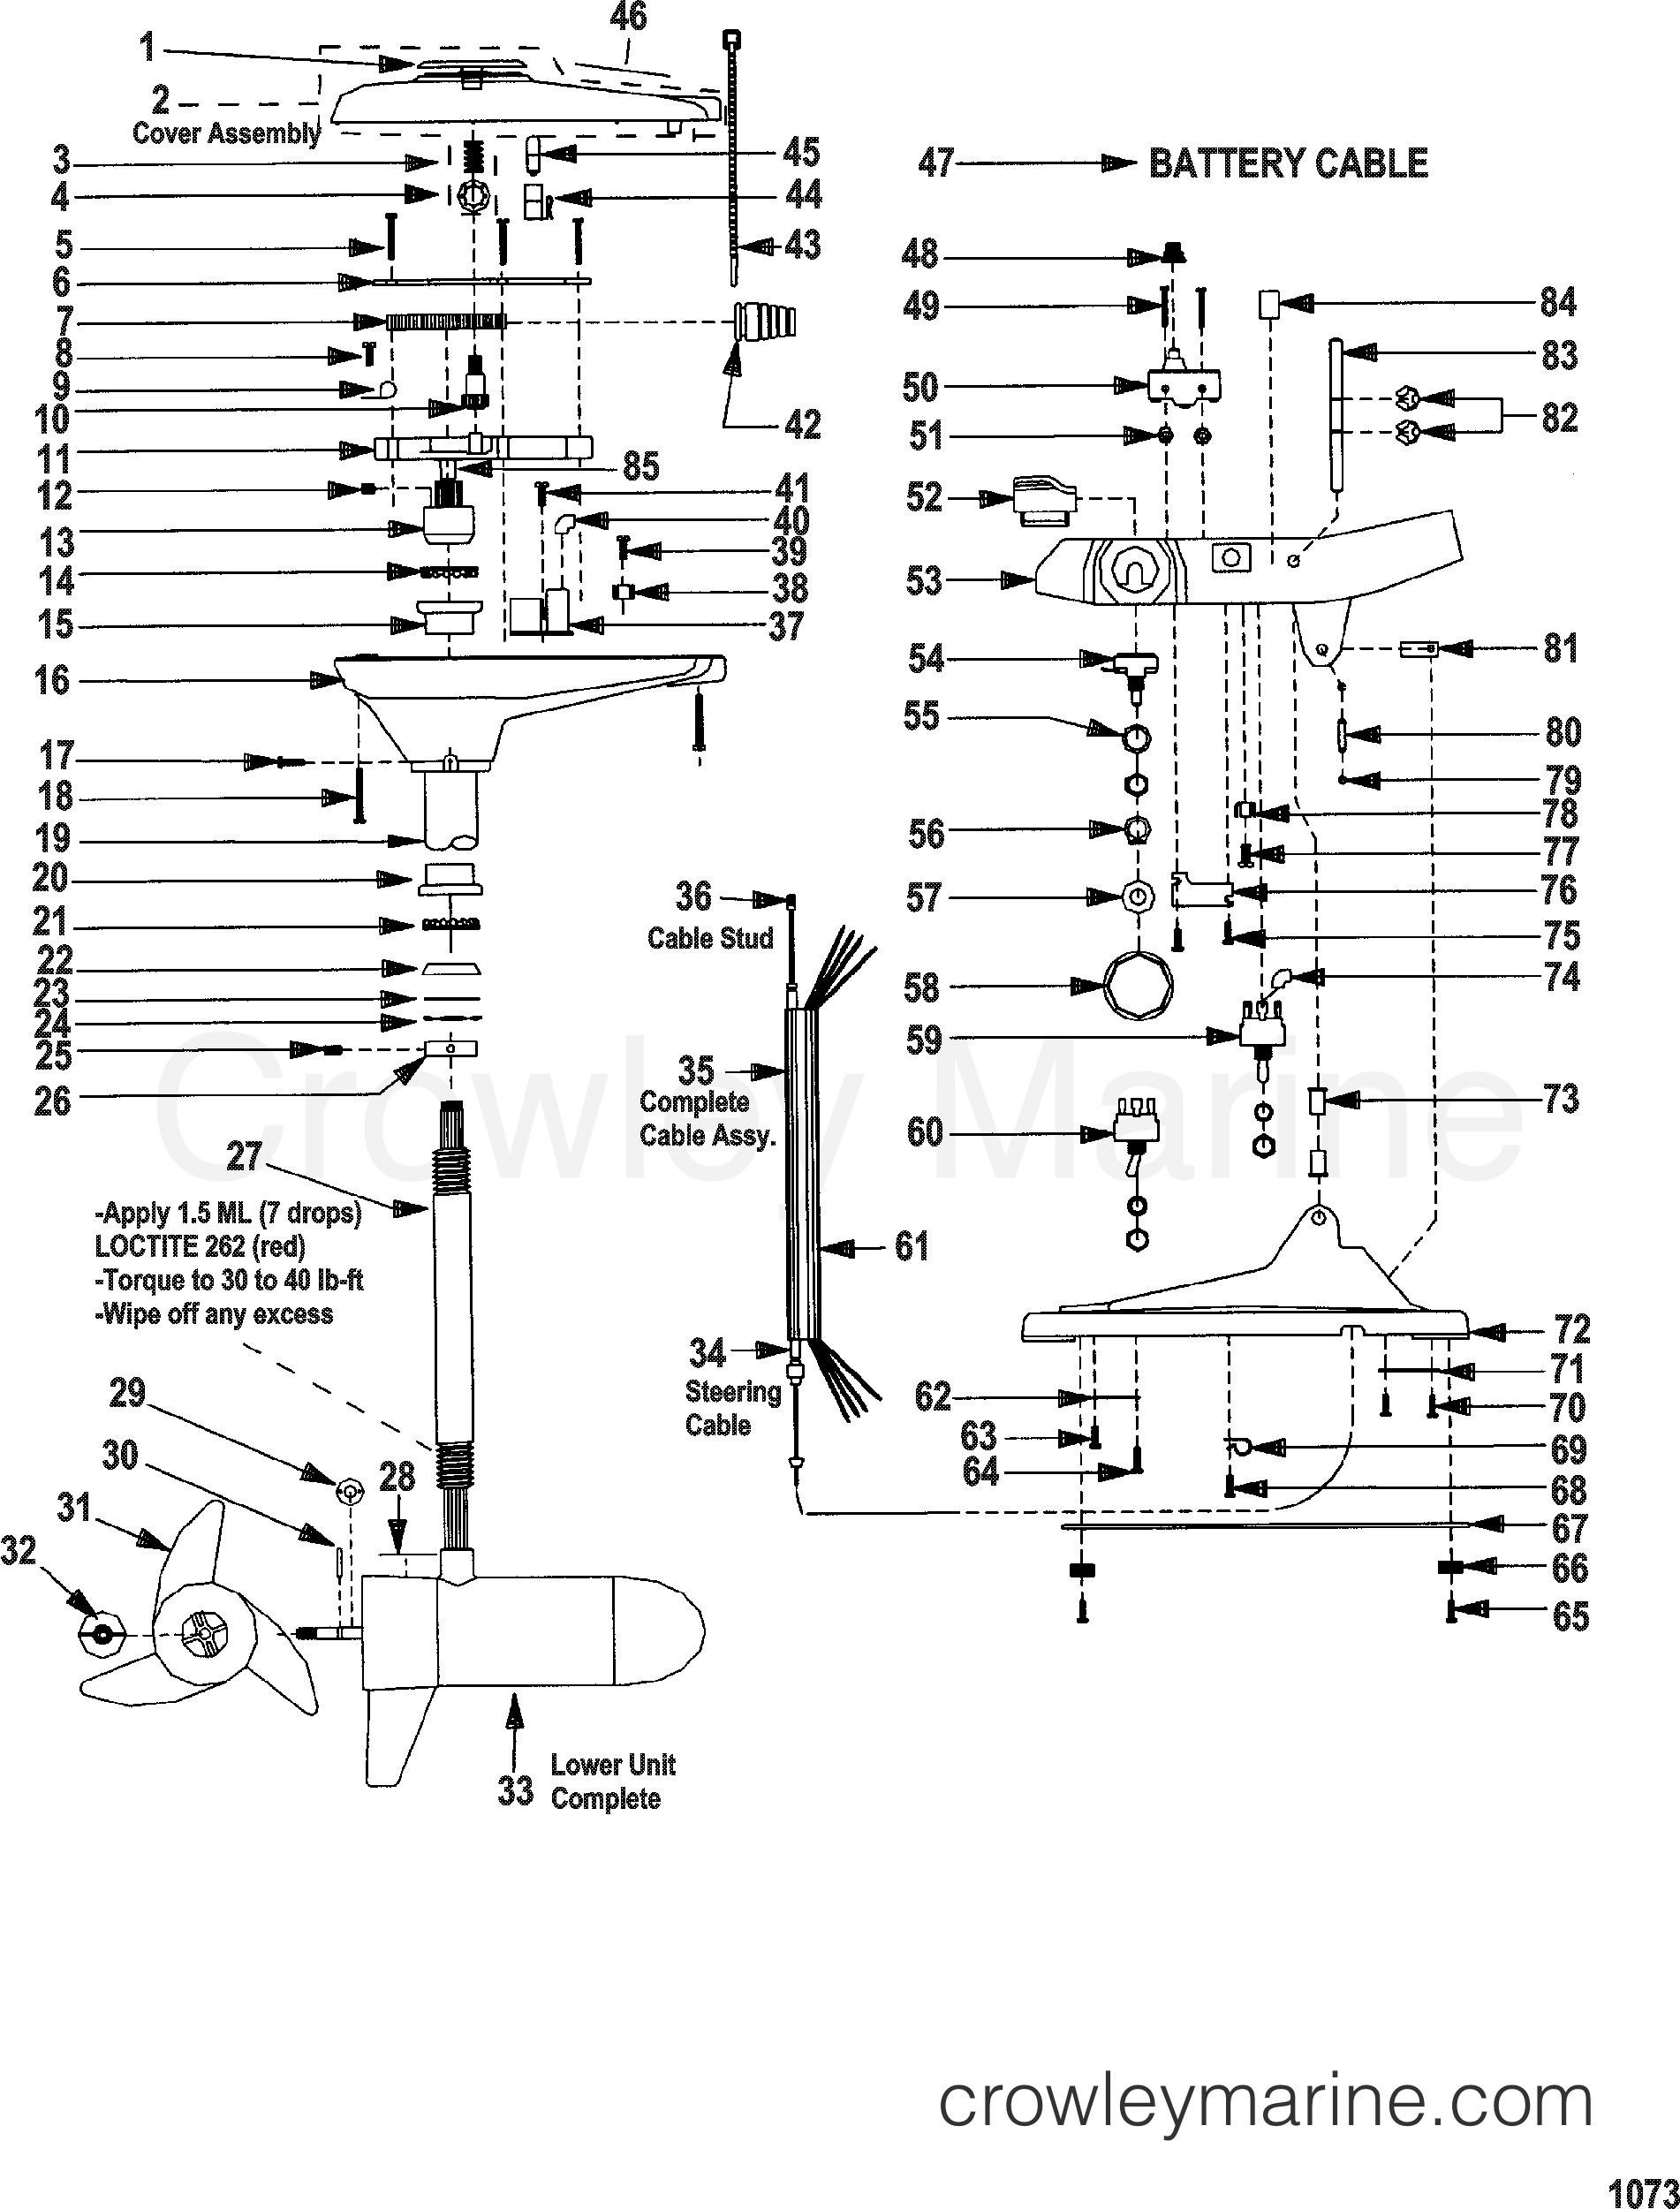 hight resolution of international dt466 engine diagram wiring diagram fo wiring diagram for dummies wiring diagrams of international dt466